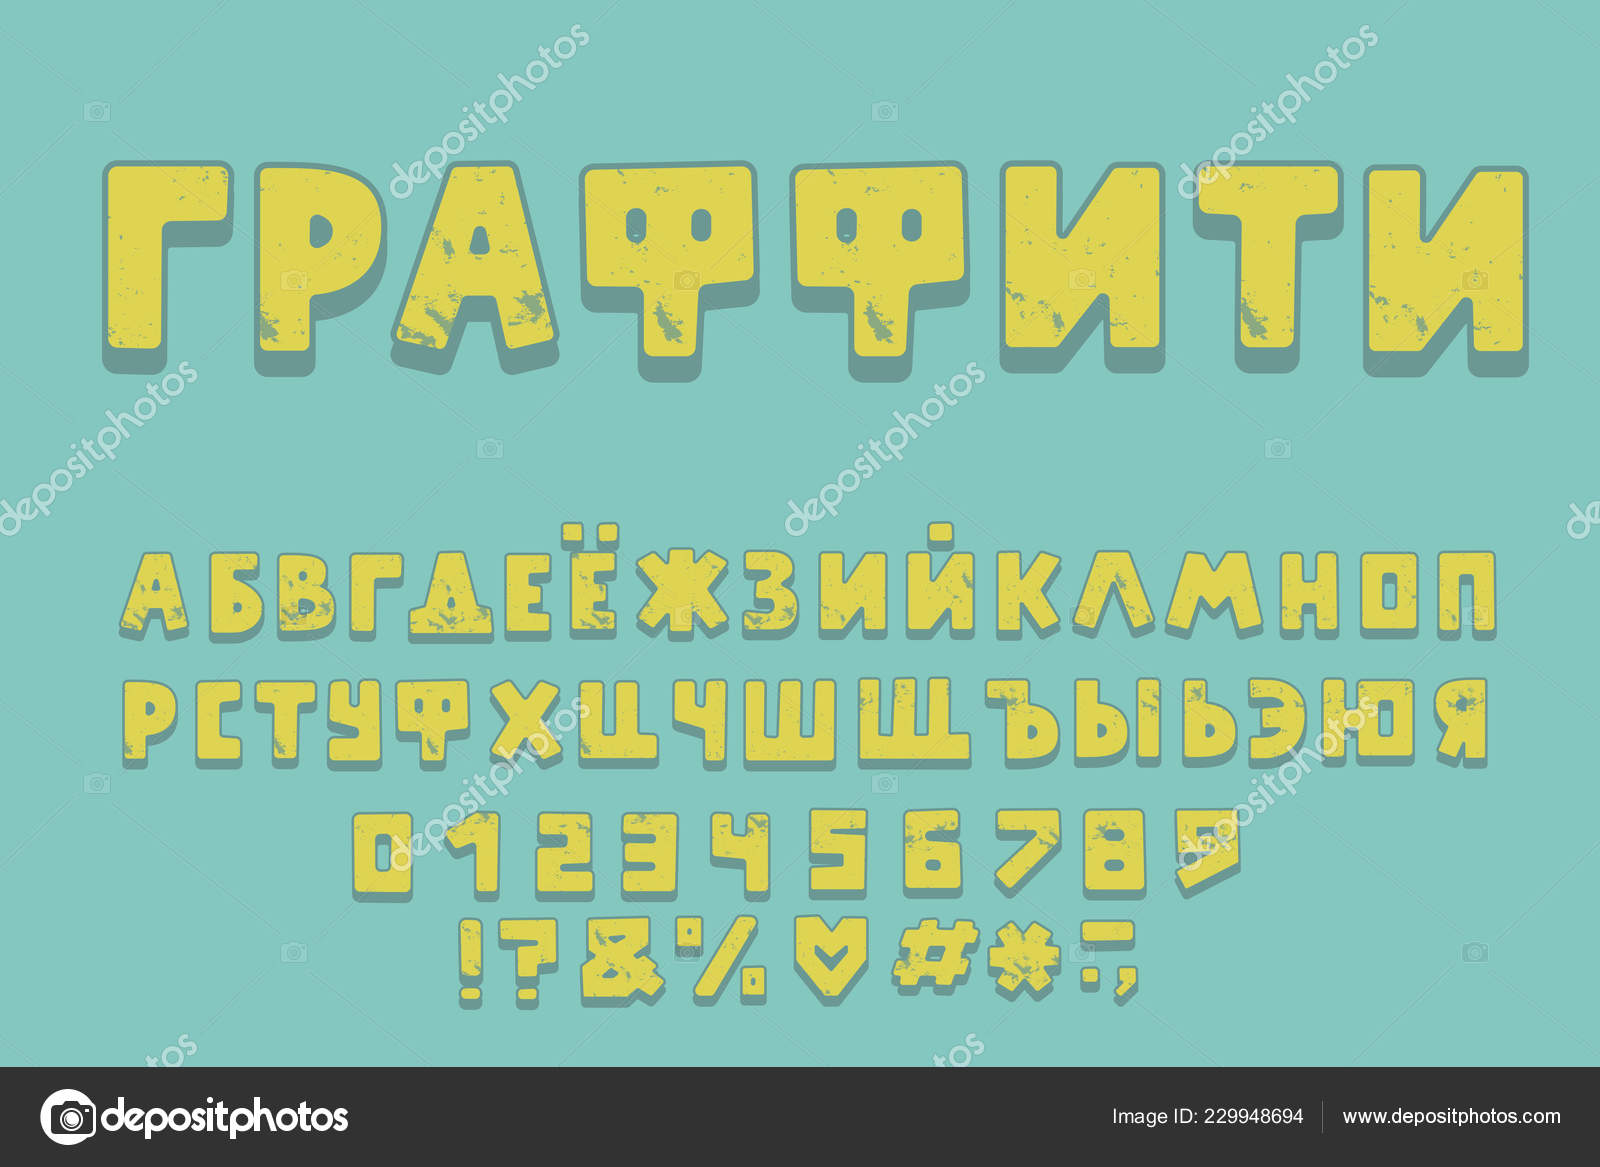 Alphabet graffiti design  Word graffiti  Russian Letters